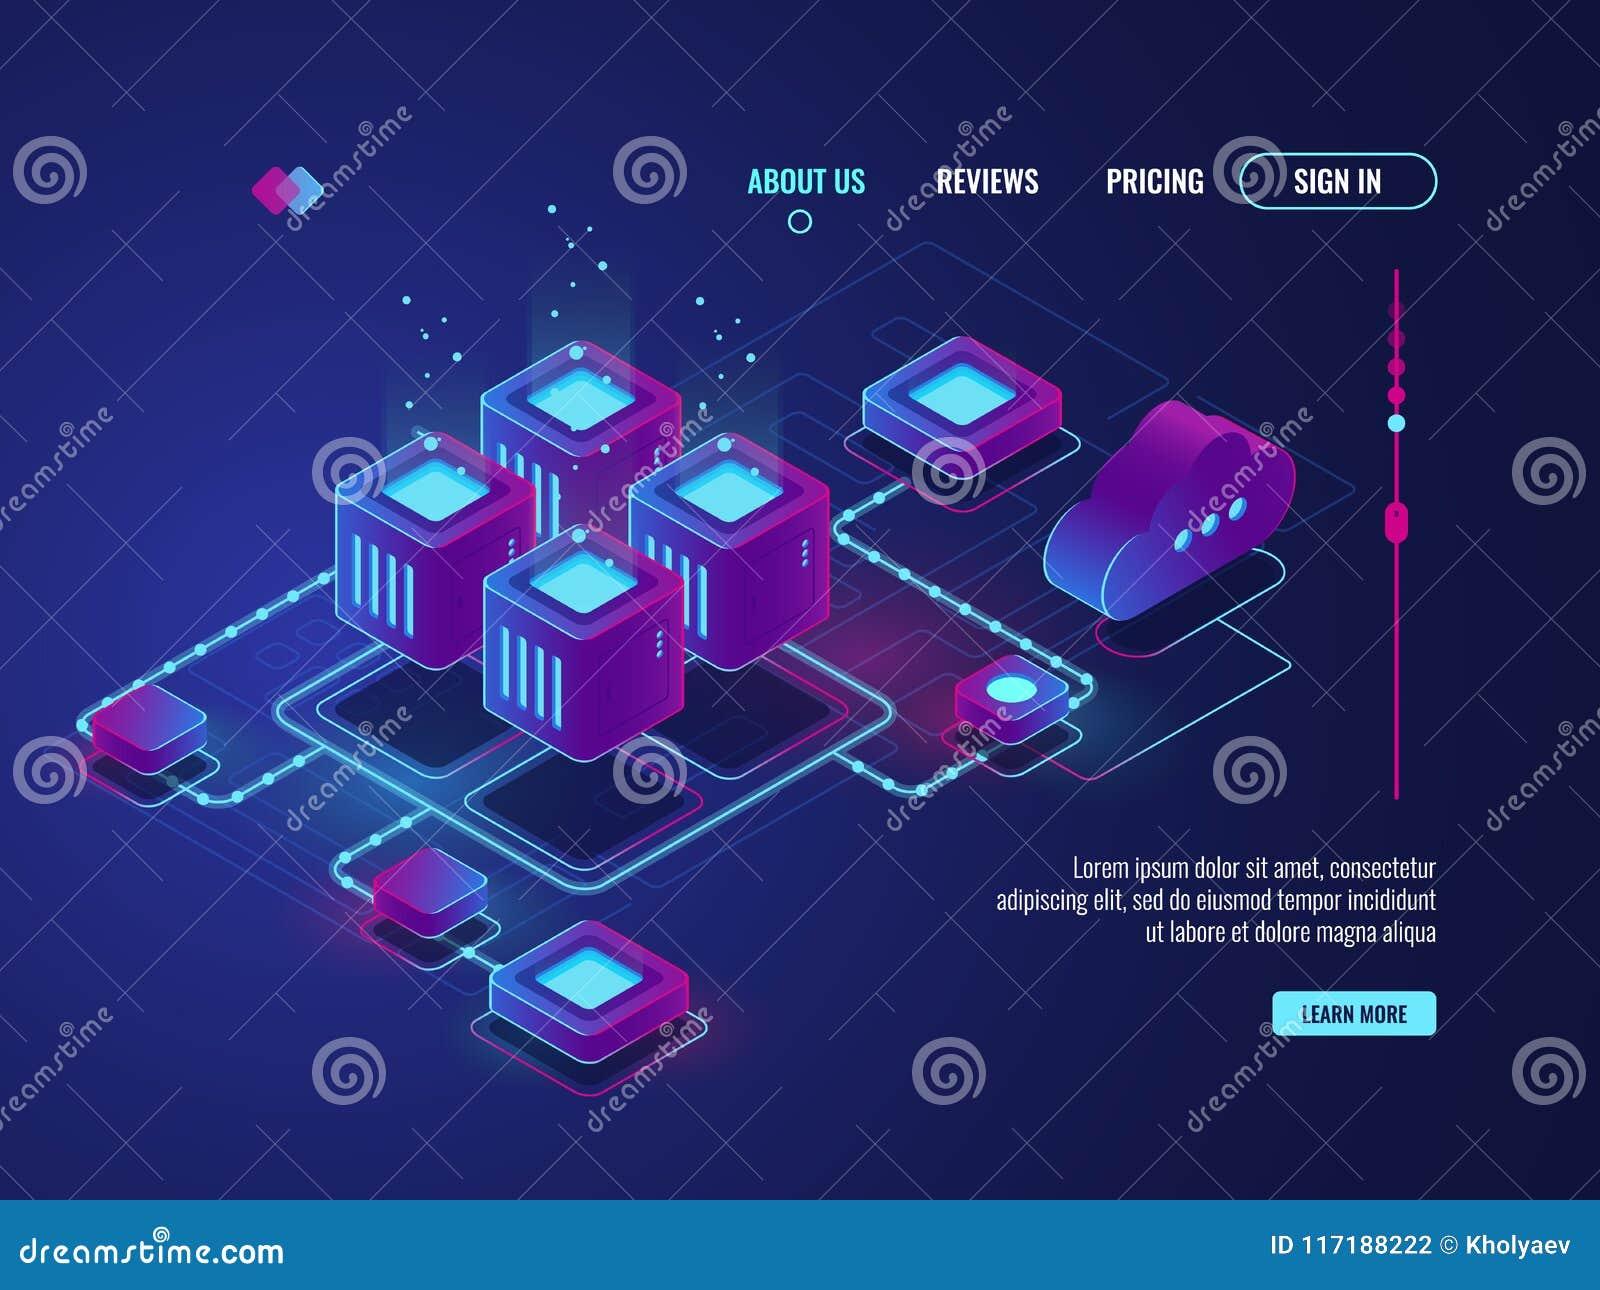 Isometric conncetion δικτύωσης, έννοια τοπολογίας δικτύων Ίντερνετ, δωμάτιο κεντρικών υπολογιστών, κέντρο δεδομένων και εικονίδιο